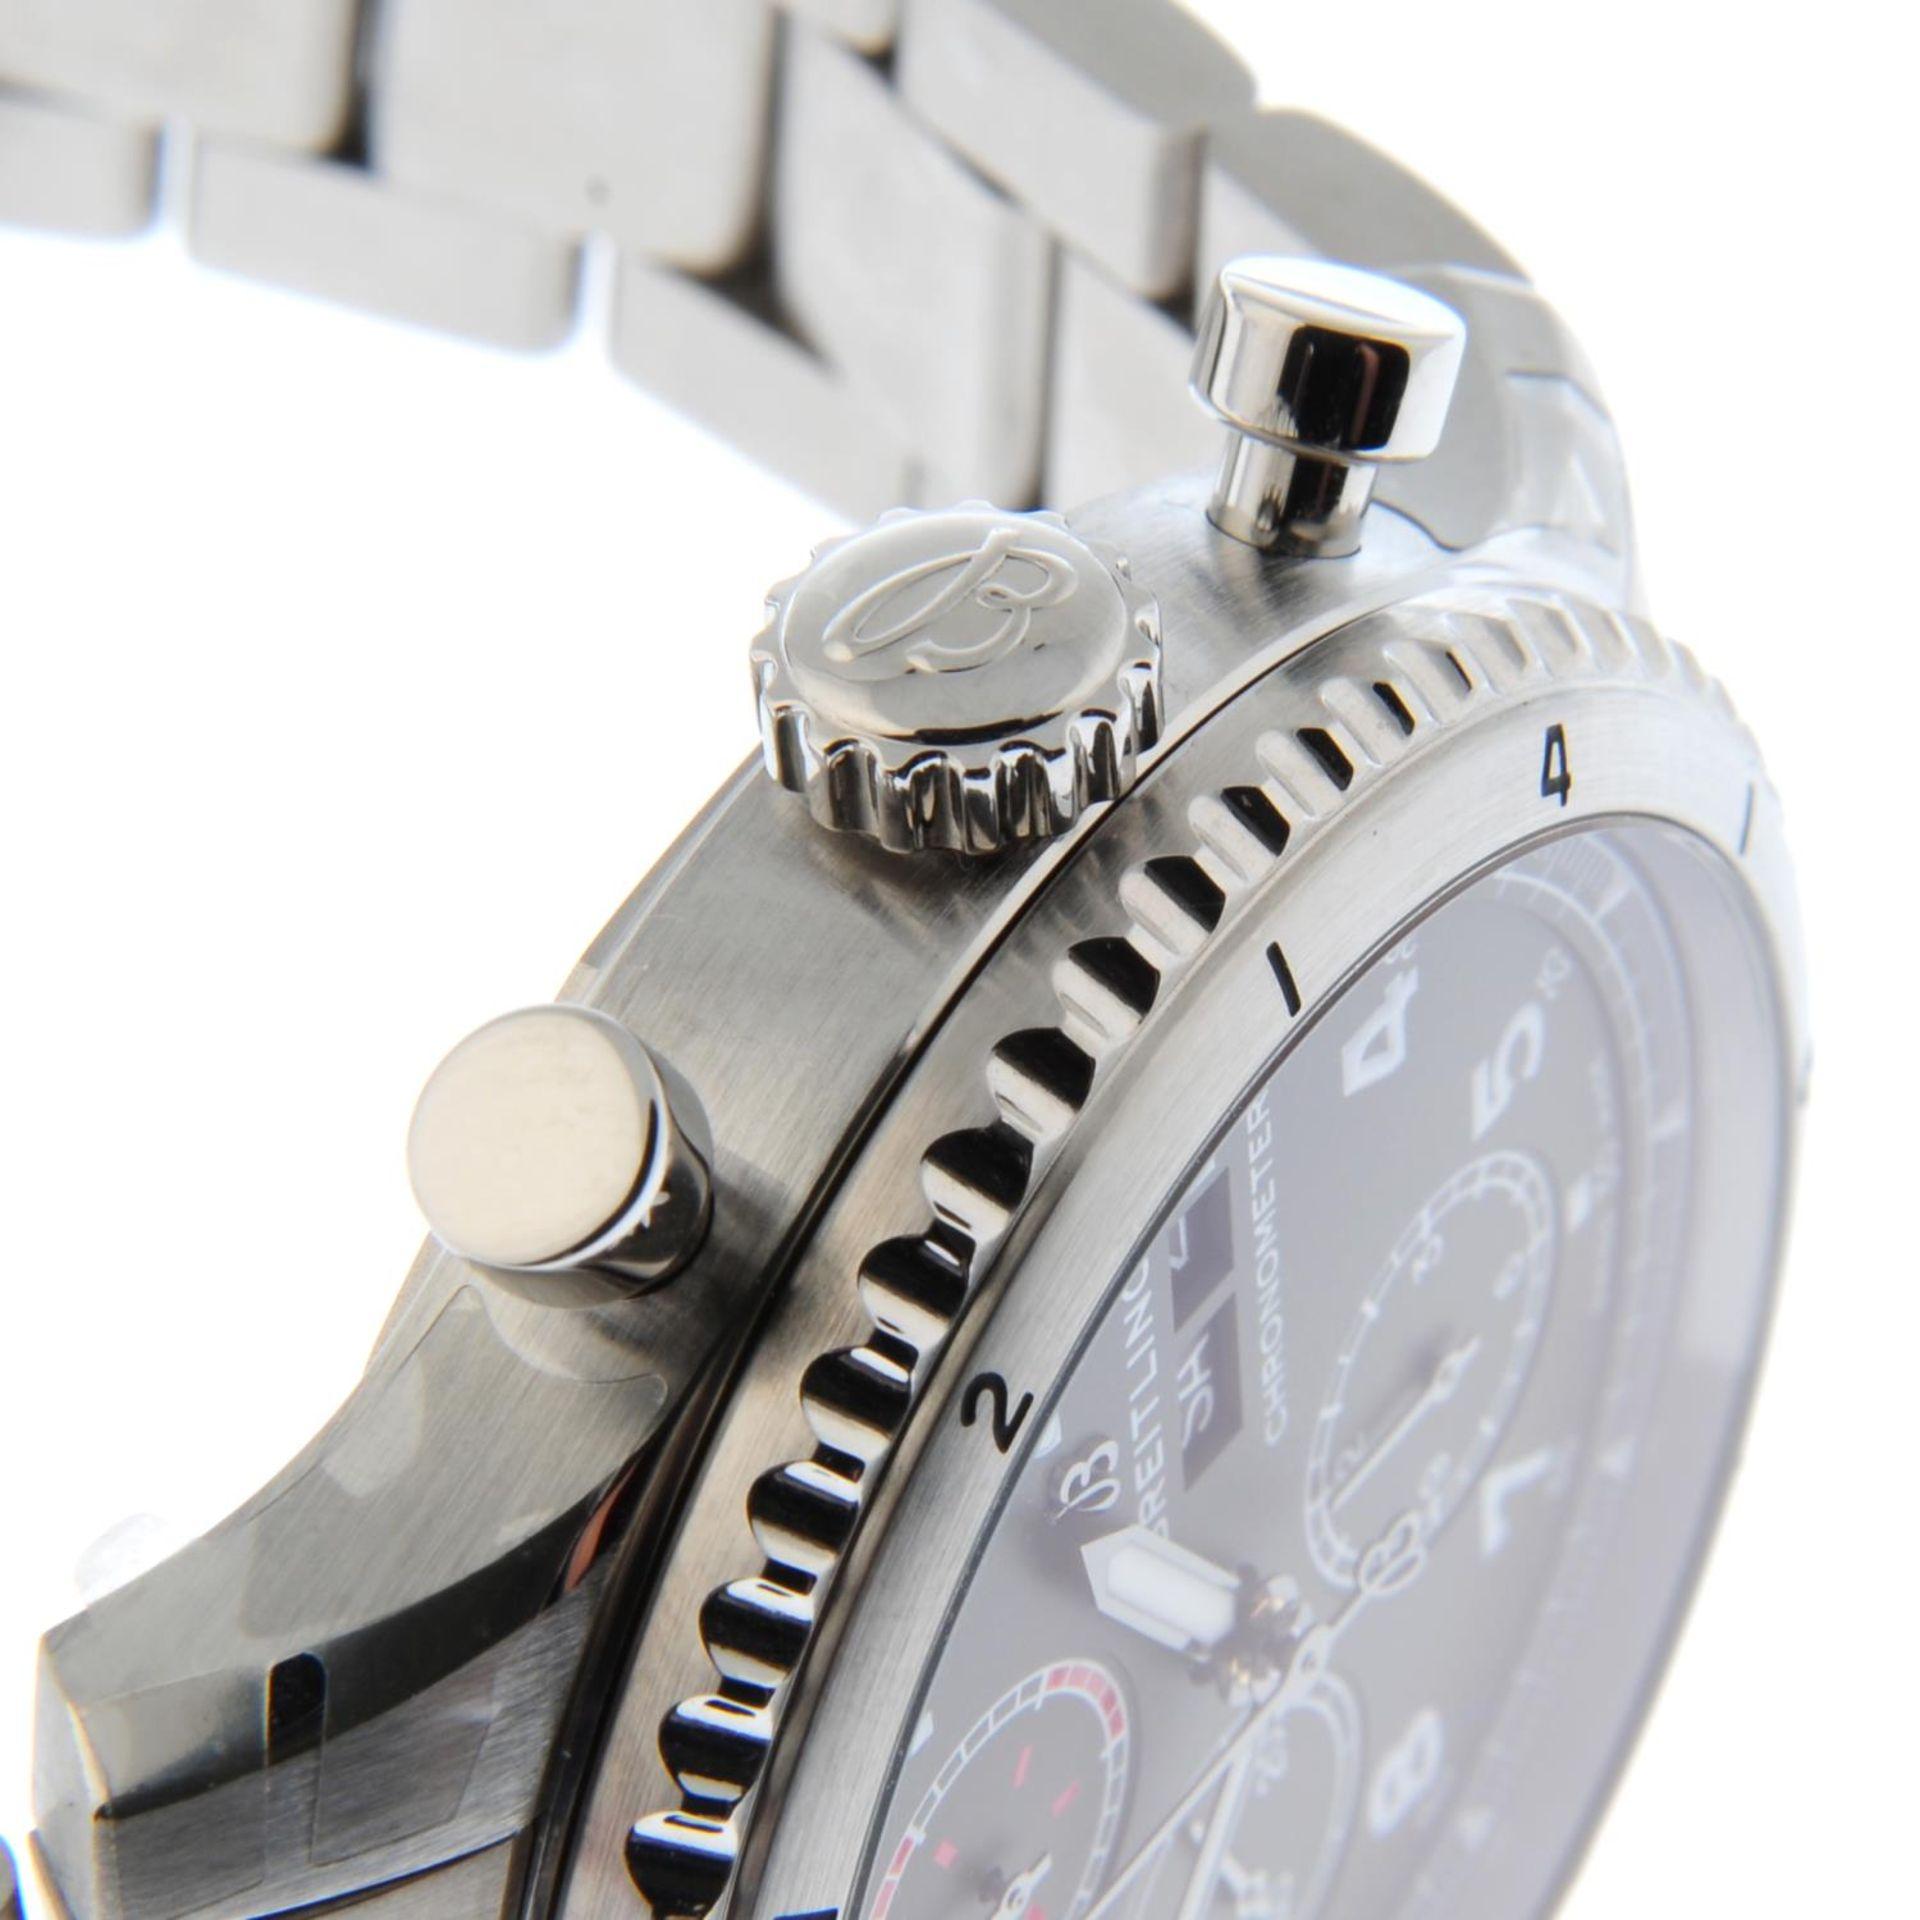 CURRENT MODEL: BREITLING - an Aviator 8 chronograph bracelet watch. - Bild 5 aus 6